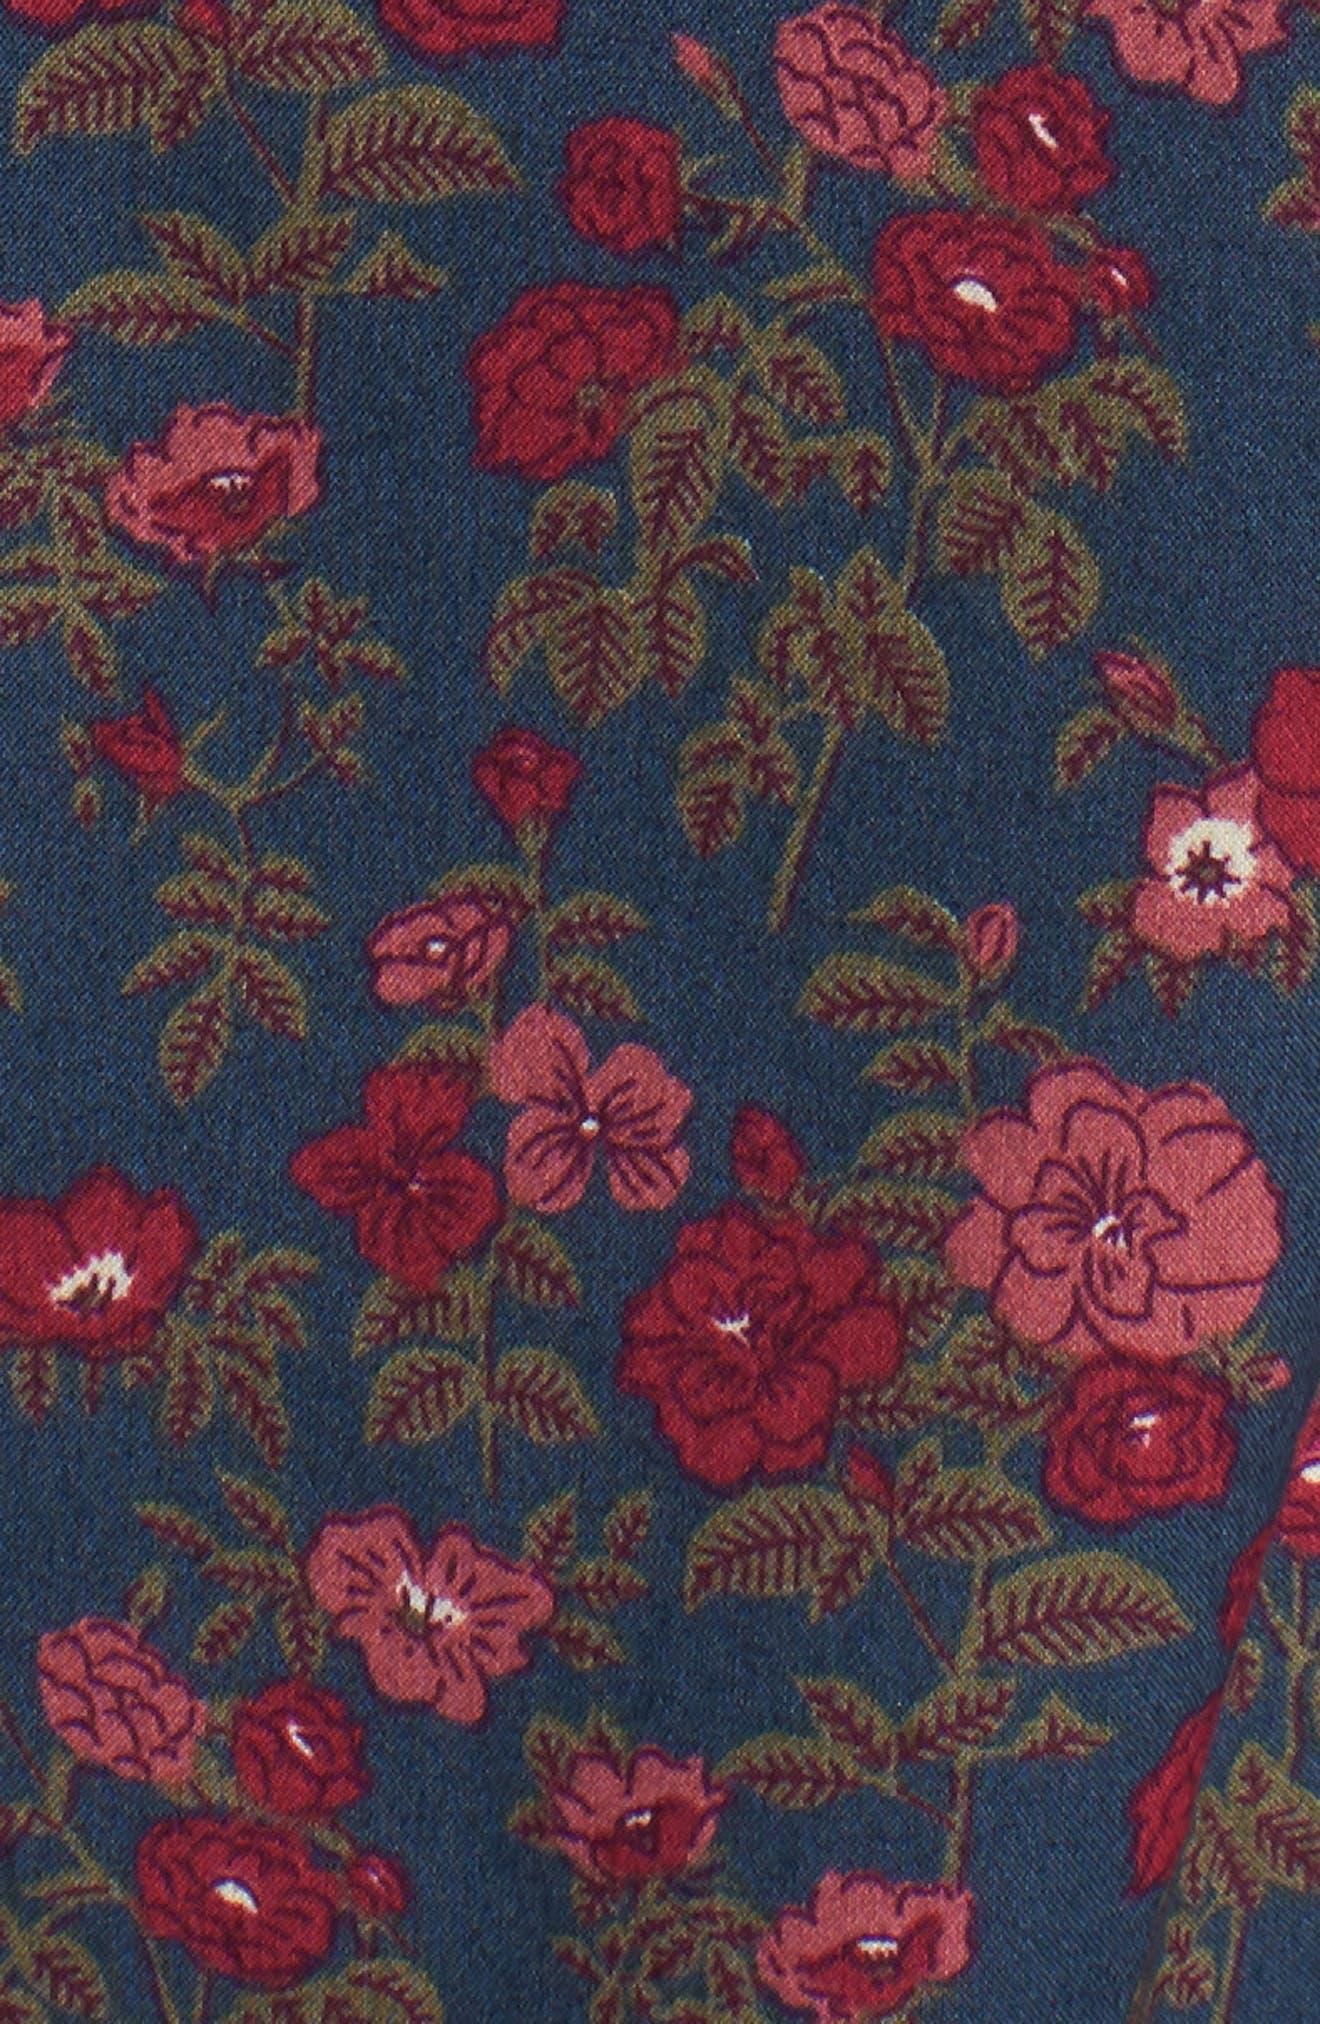 Riviera Slim Fit Floral Print Sport Shirt,                             Alternate thumbnail 5, color,                             Dandy Floral - Pickled Beet